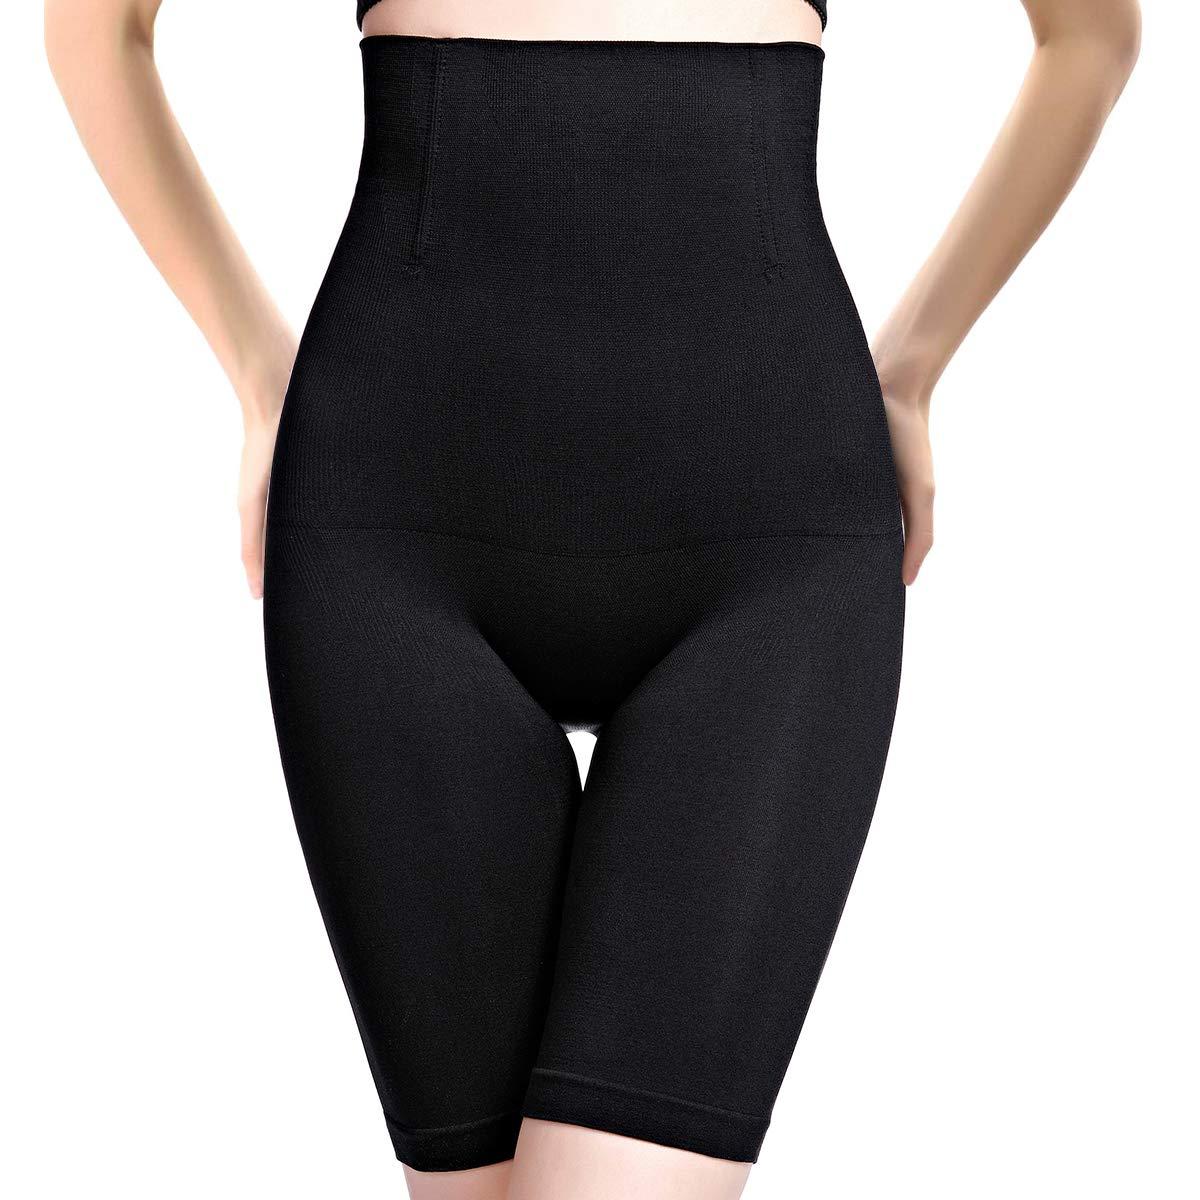 PANHAYO Womens Shapewear Tummy Control Shorts Thigh Slimmer High-Waist Panty Firm Control Body Shaper